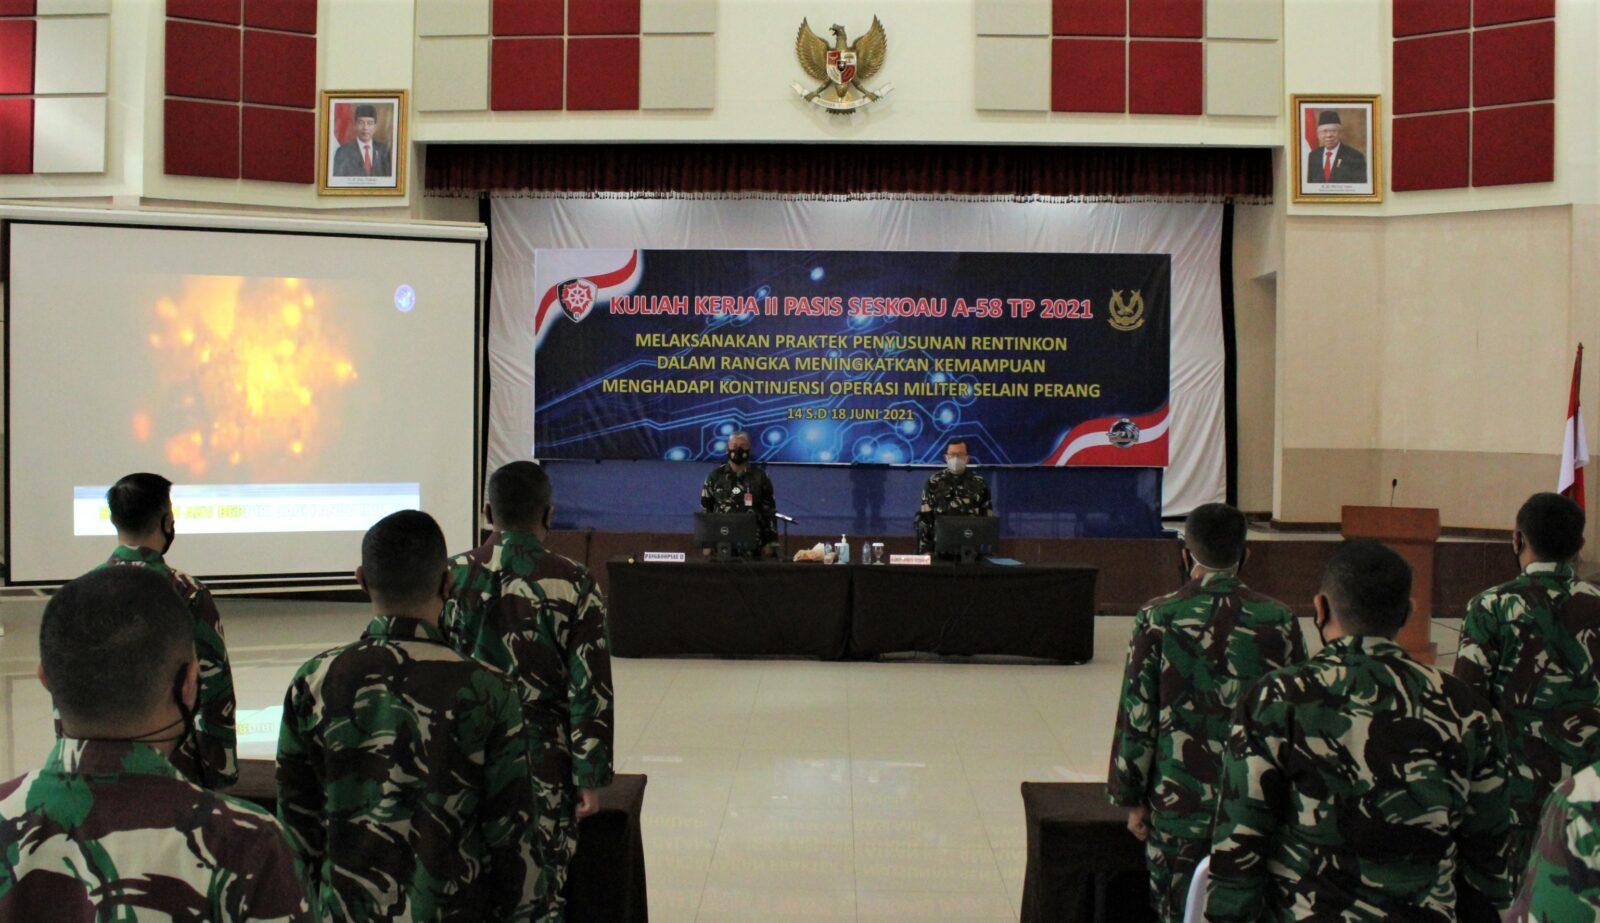 Laksanakan Kuliah Kerja II, 38 Pasis Seskoau A-58 Kunjungi Koopsau II